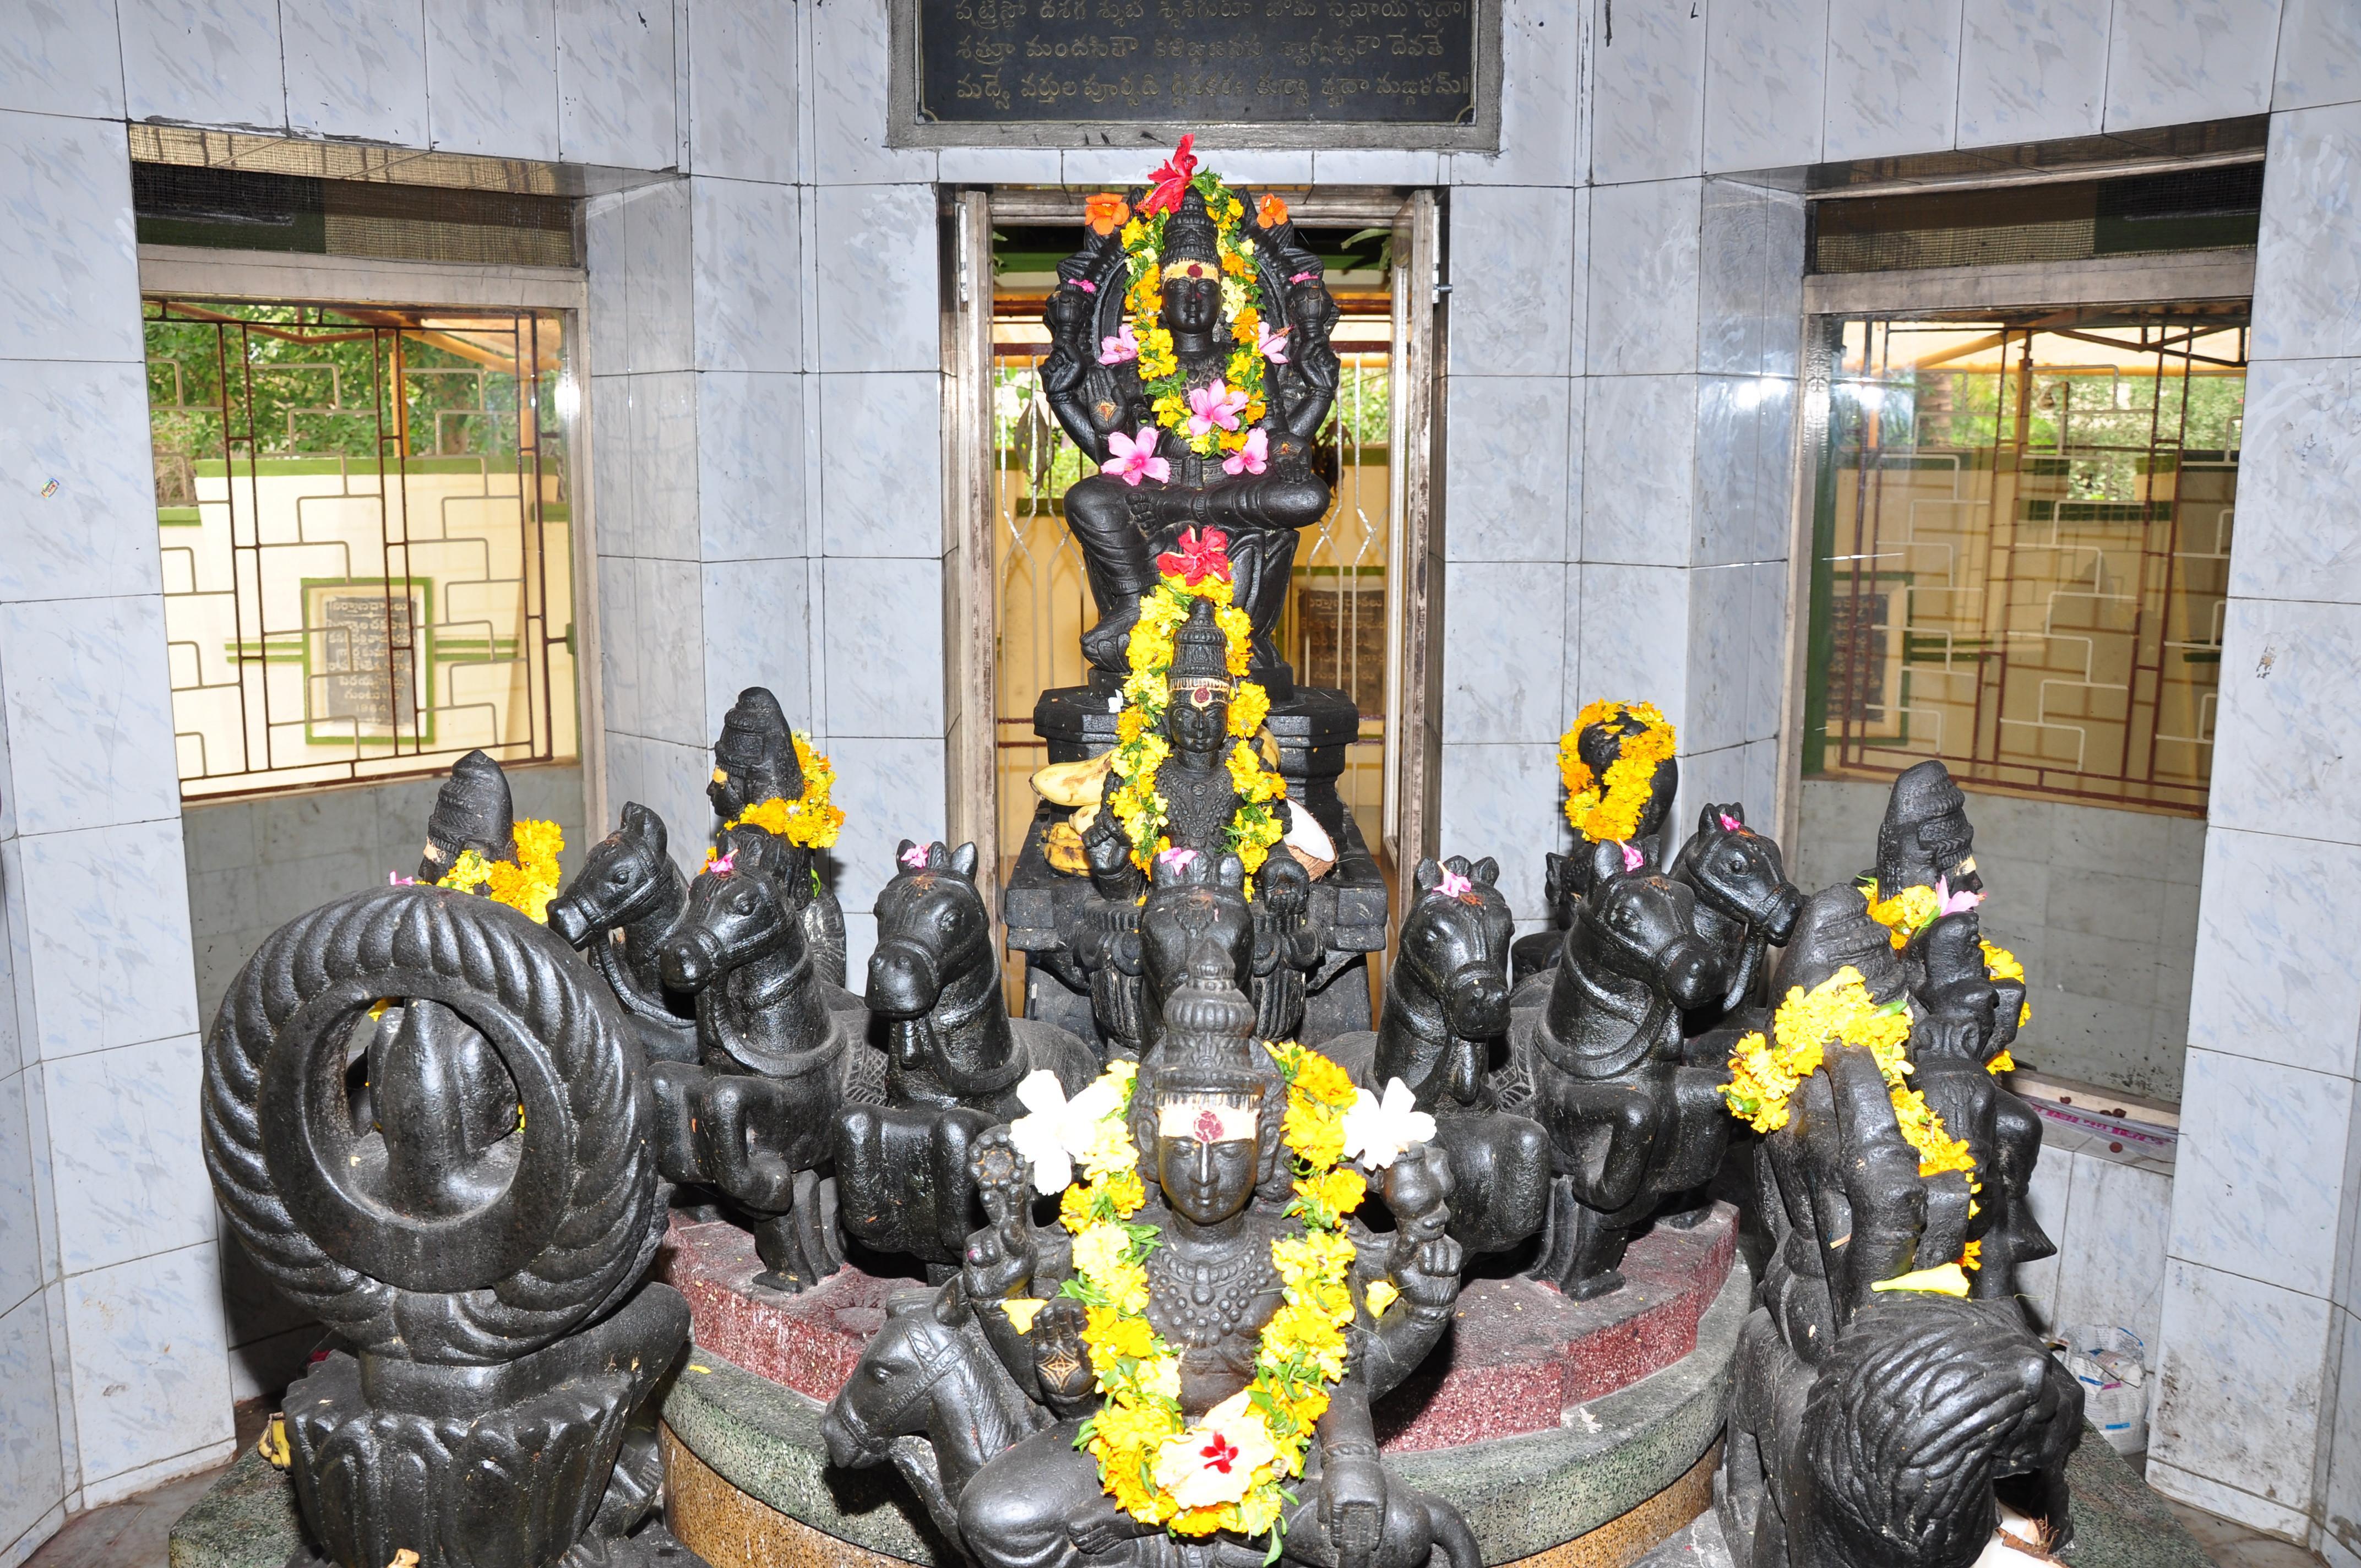 Remedies For Grah Doshs /గ్రహ దోషాలను తొలగించుకోవాలంటే ఏమి చెయ్యాలి ?